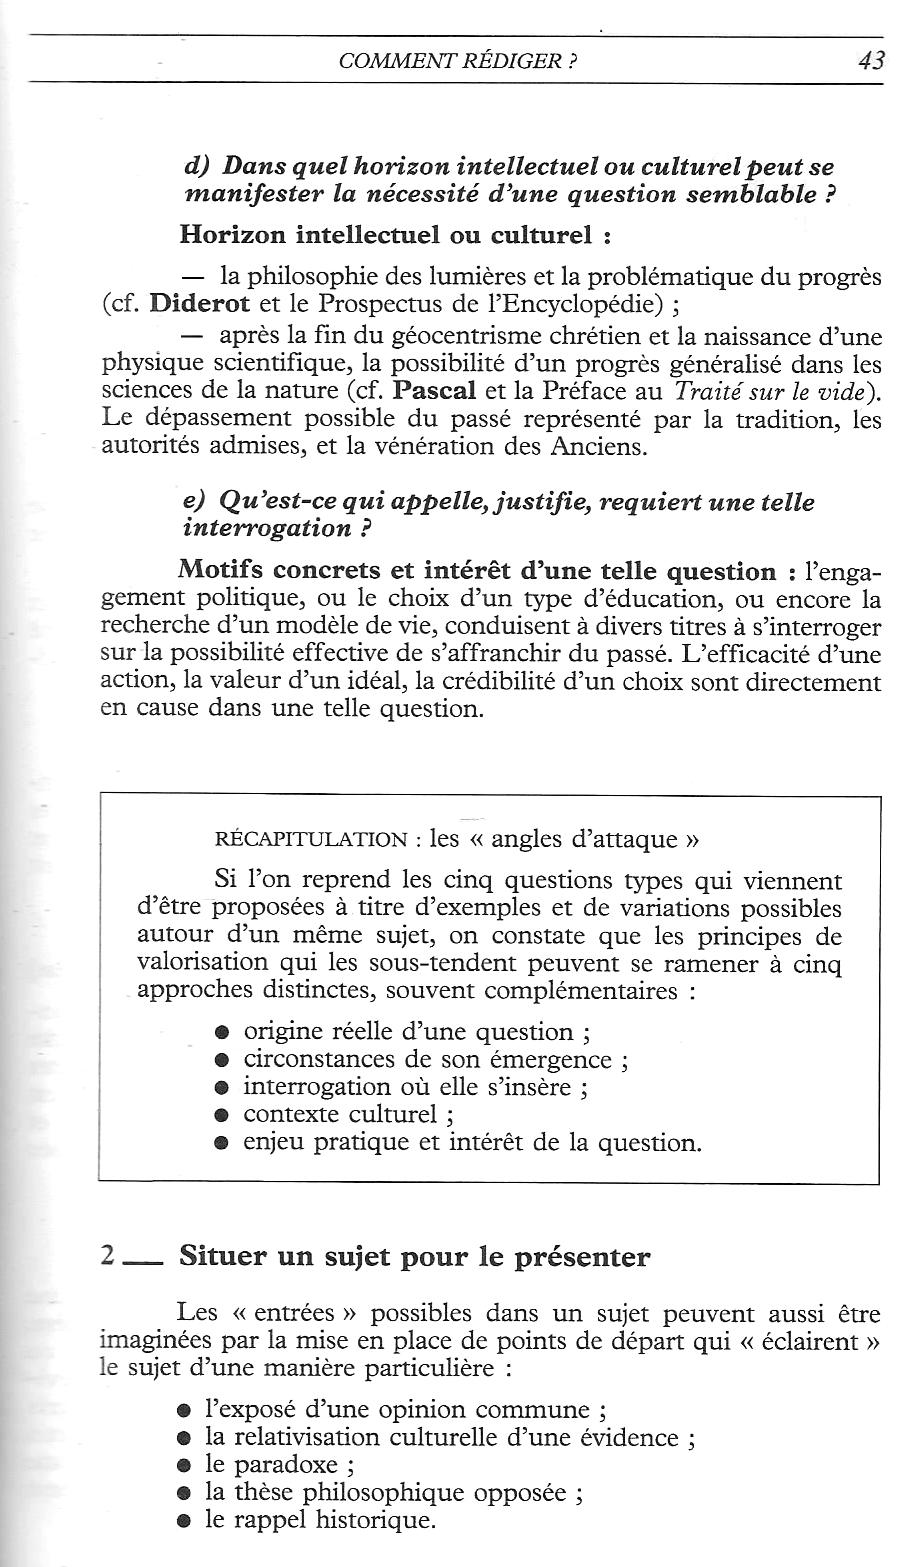 Super Manuels anciens: Pena-Ruiz, La Dissertation de philosophie (1986  OS03